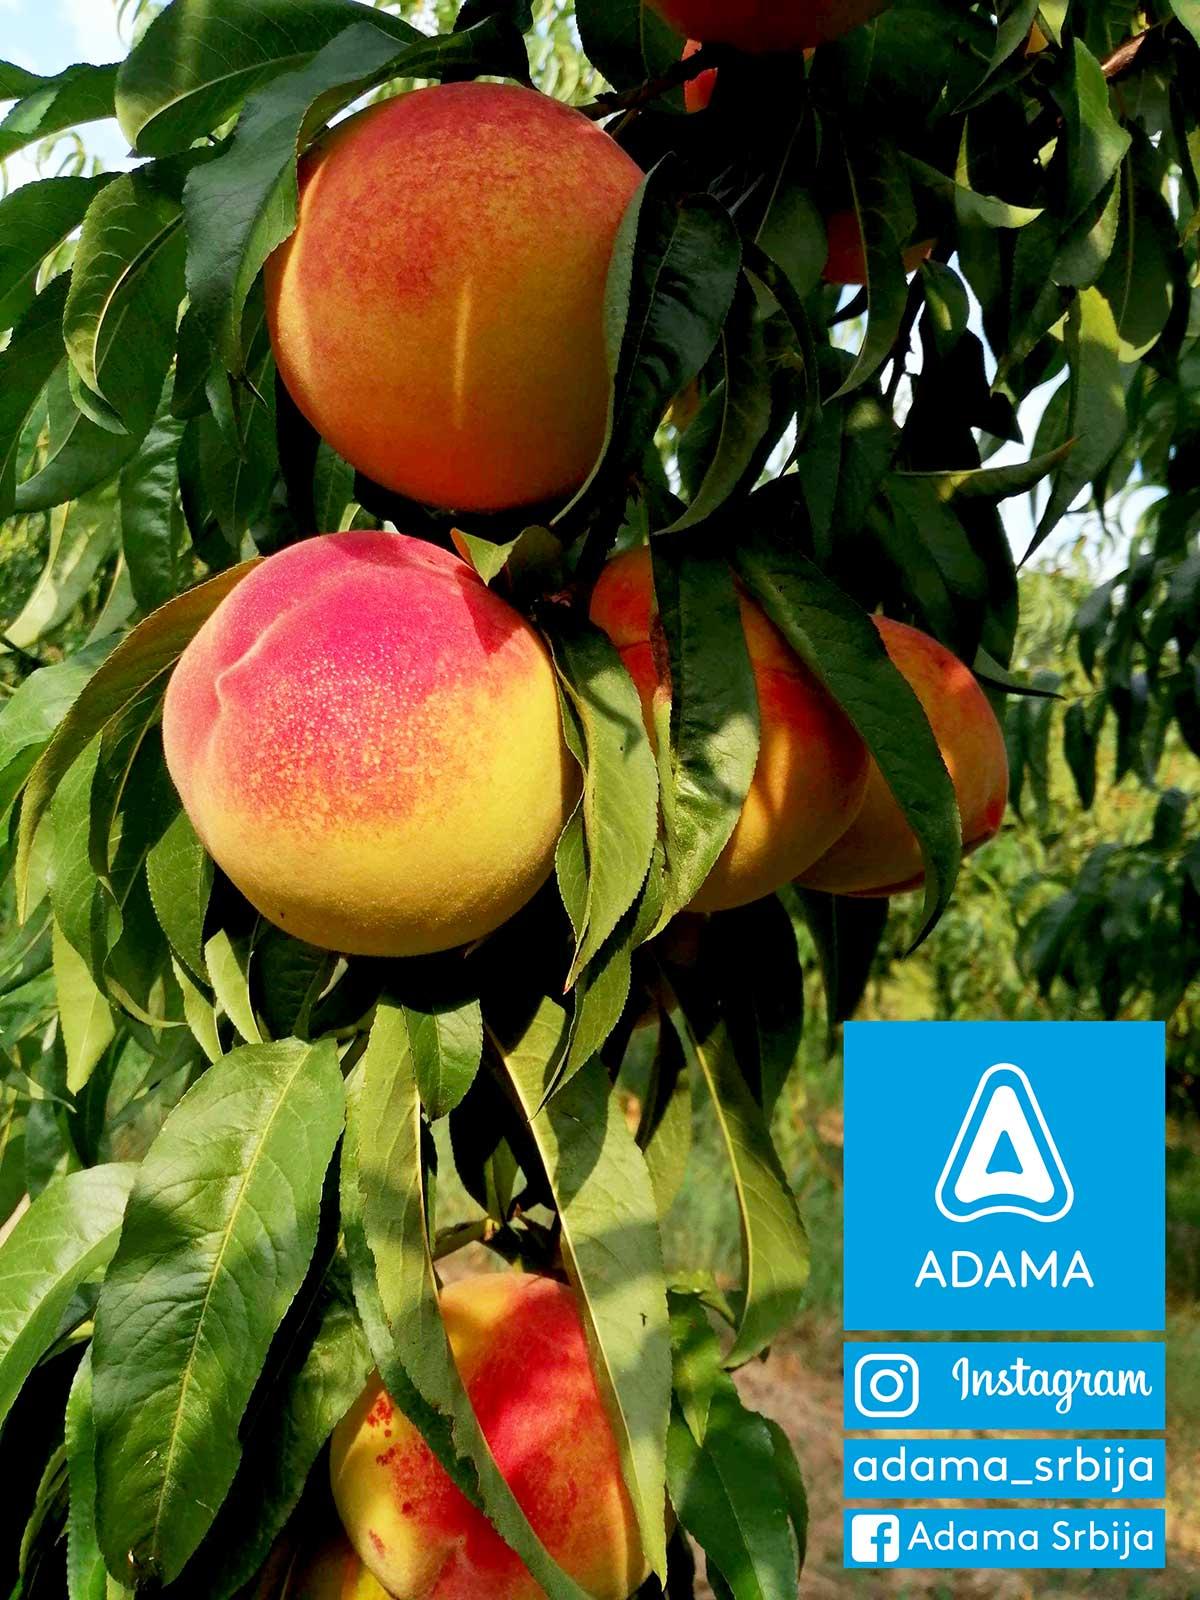 Agrosaveti---Adama---Sljiva---Breskva---Mali-Pozarevac---Ilija-Stankovic---Fotkaj-plod-i-uvecaj-rod---Konkurs-04